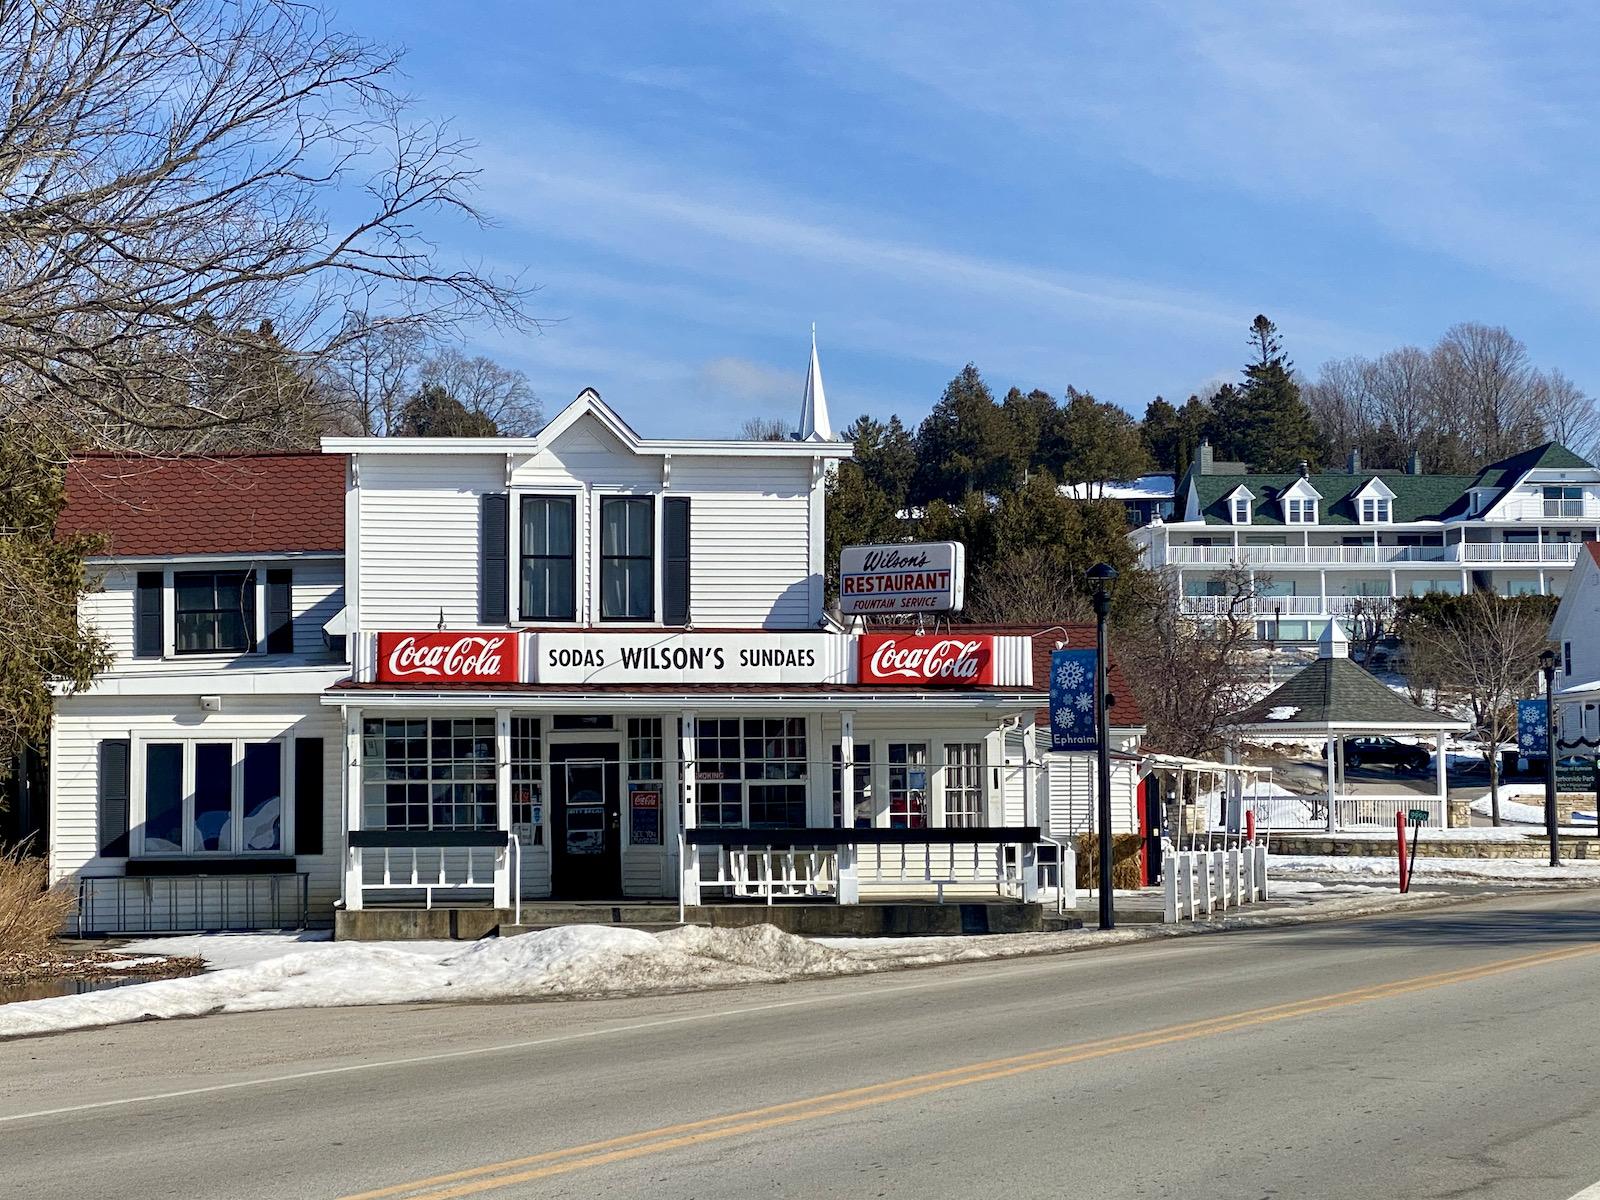 Wilson's Restaurant & Ice Cream Parlor